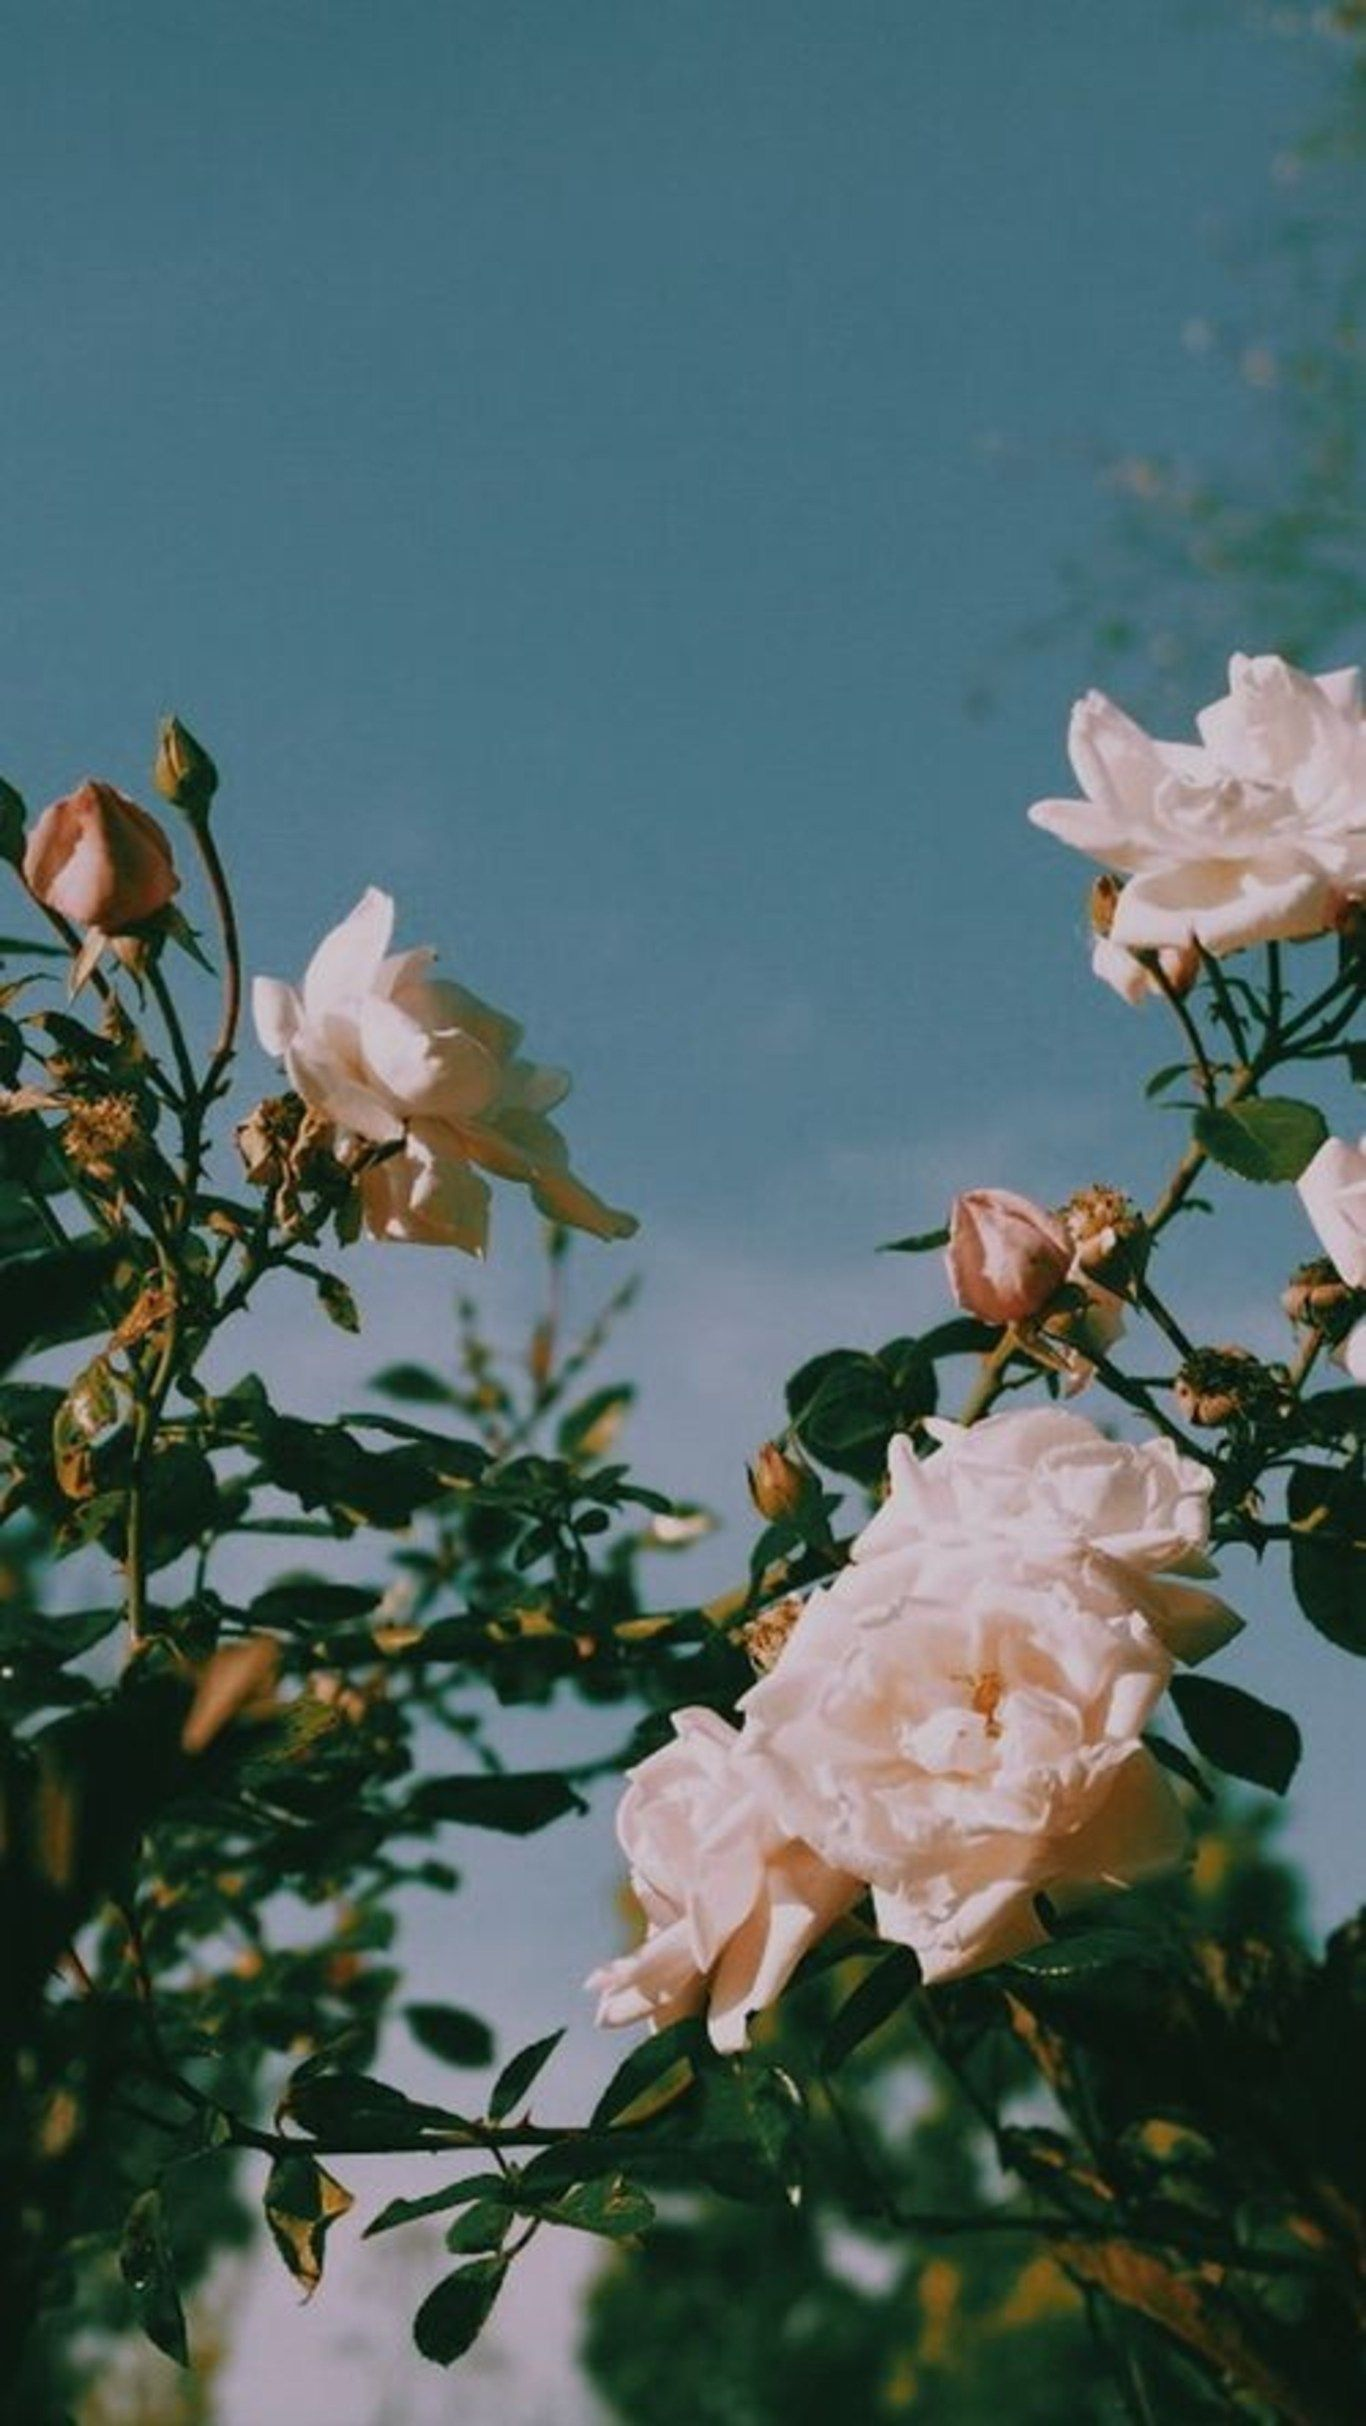 Flower Garden Roses Petal Rose Pink Rose Family Vintage Phone Wallpaper Aesthetic Wallpapers Iphone Wallpaper Vintage